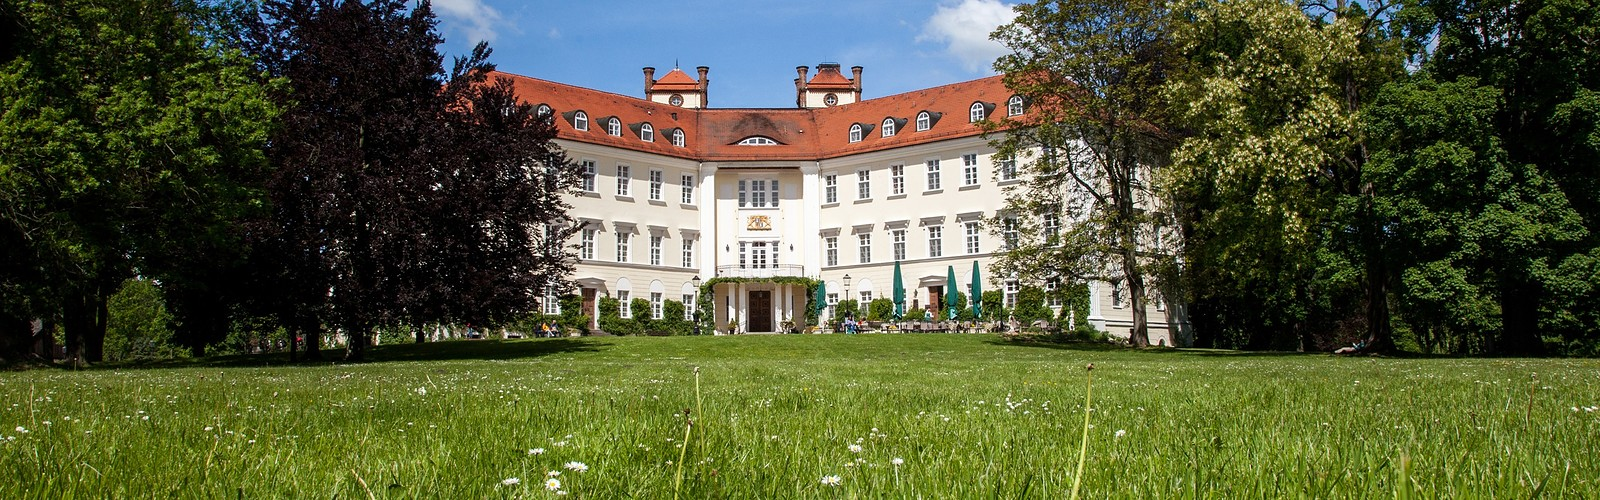 Schloss Lübbenau, Foto: TMB-Fotoarchiv/Peter Becker